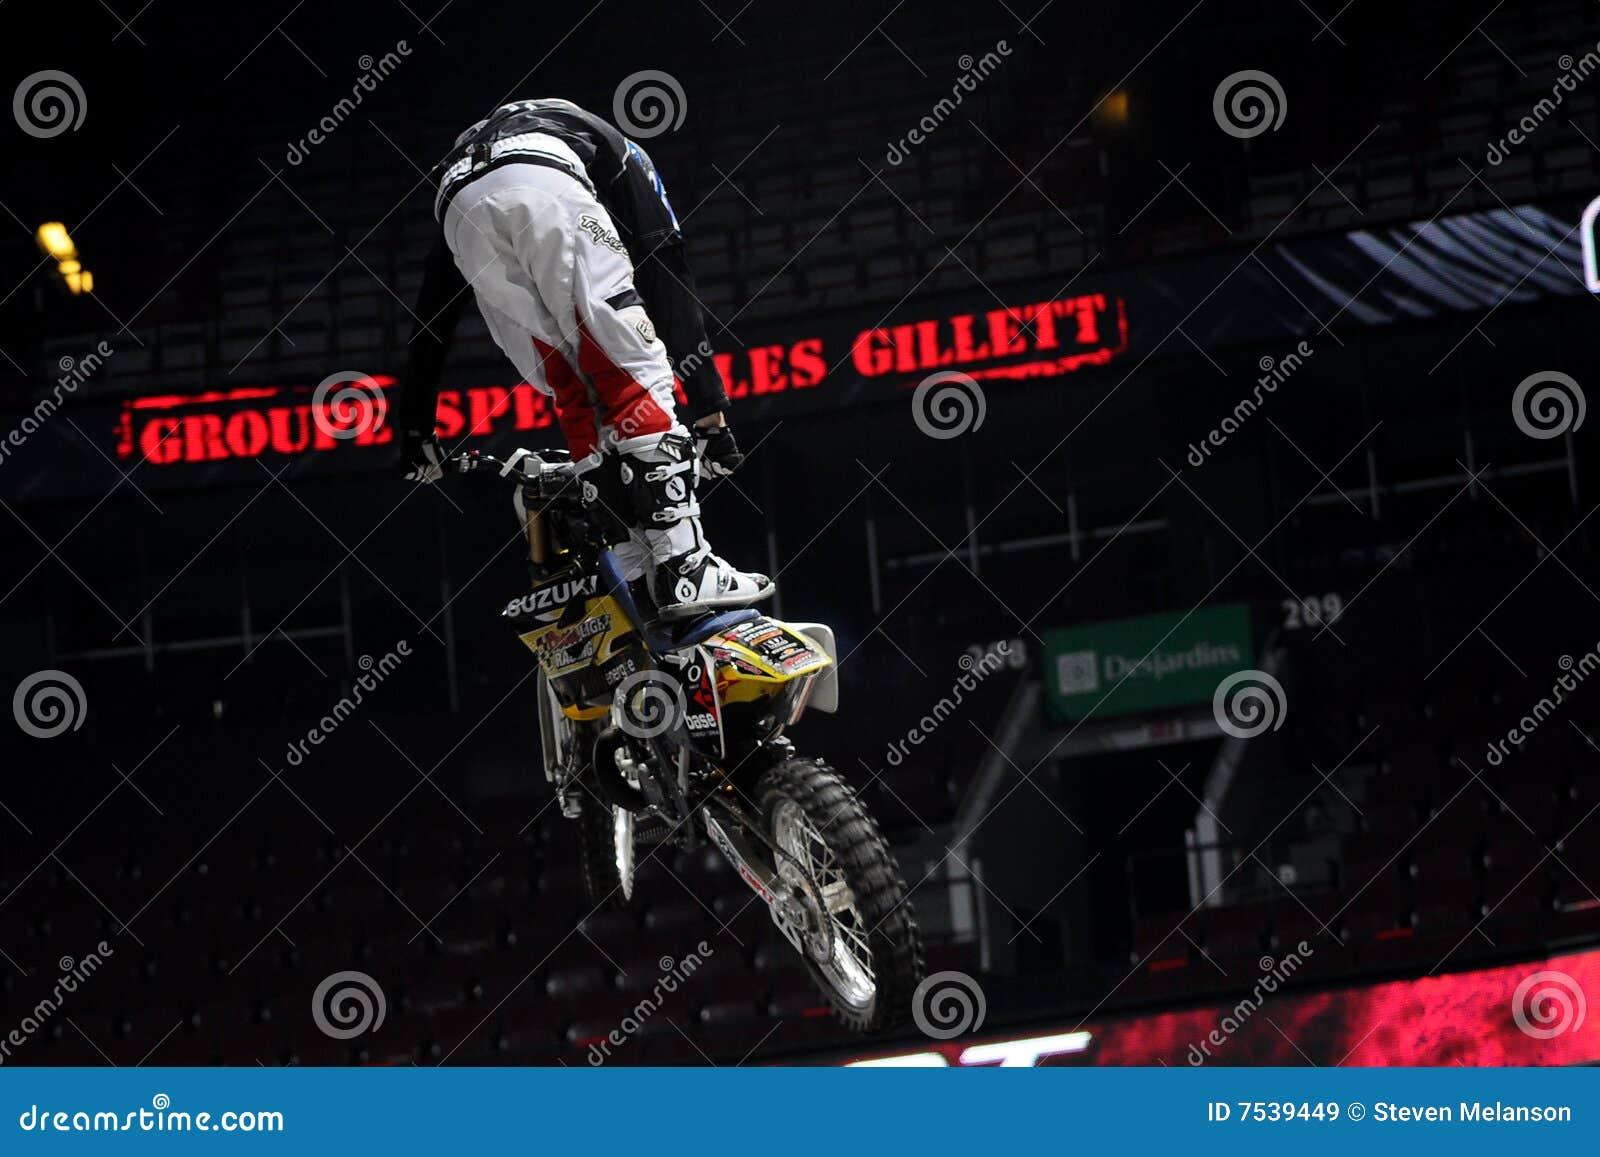 Ben Milot Free Style Motocross Editorial Stock Image - Image